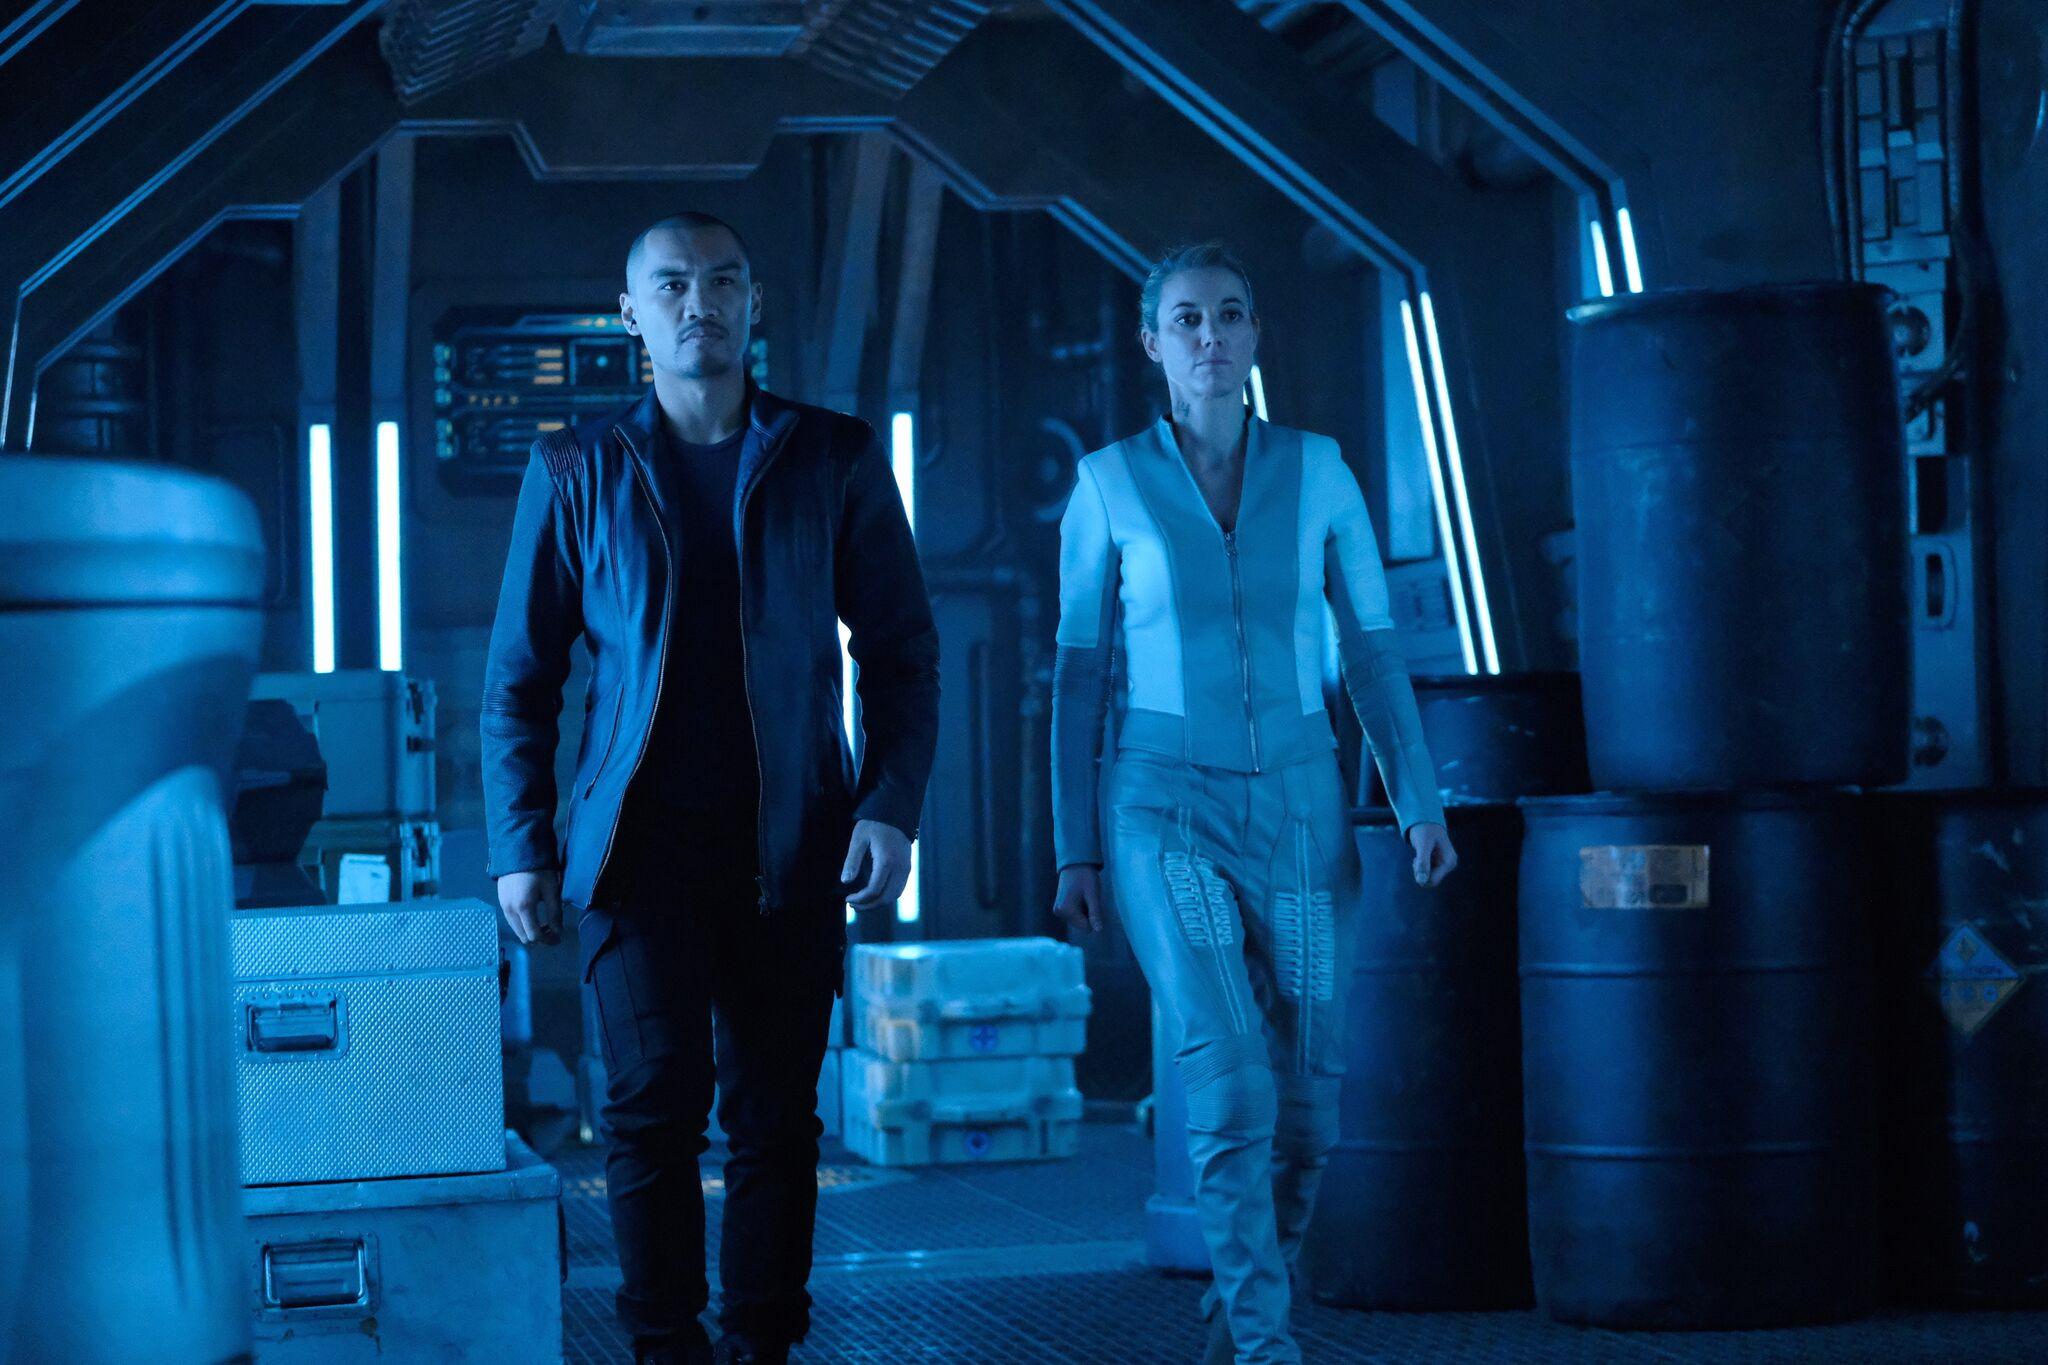 July 19, 2017: What lies ahead for Dark Matter's third season